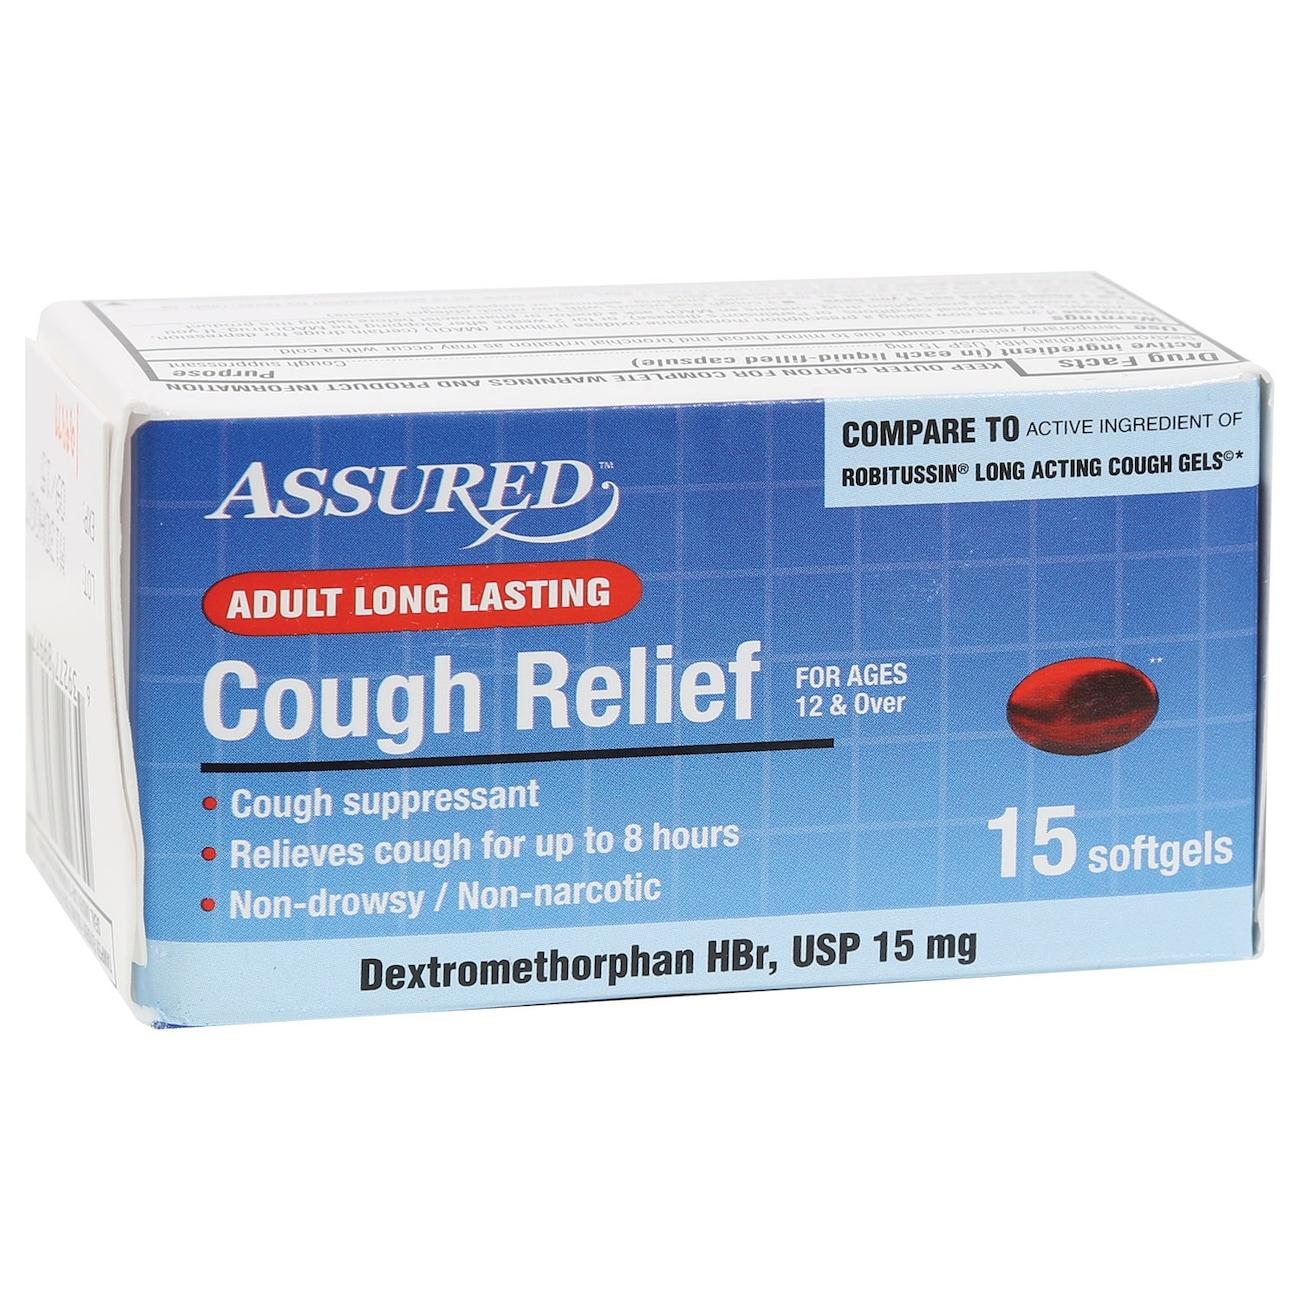 Assured Long Lasting Cough Relief Softgels, 15-ct. Packs